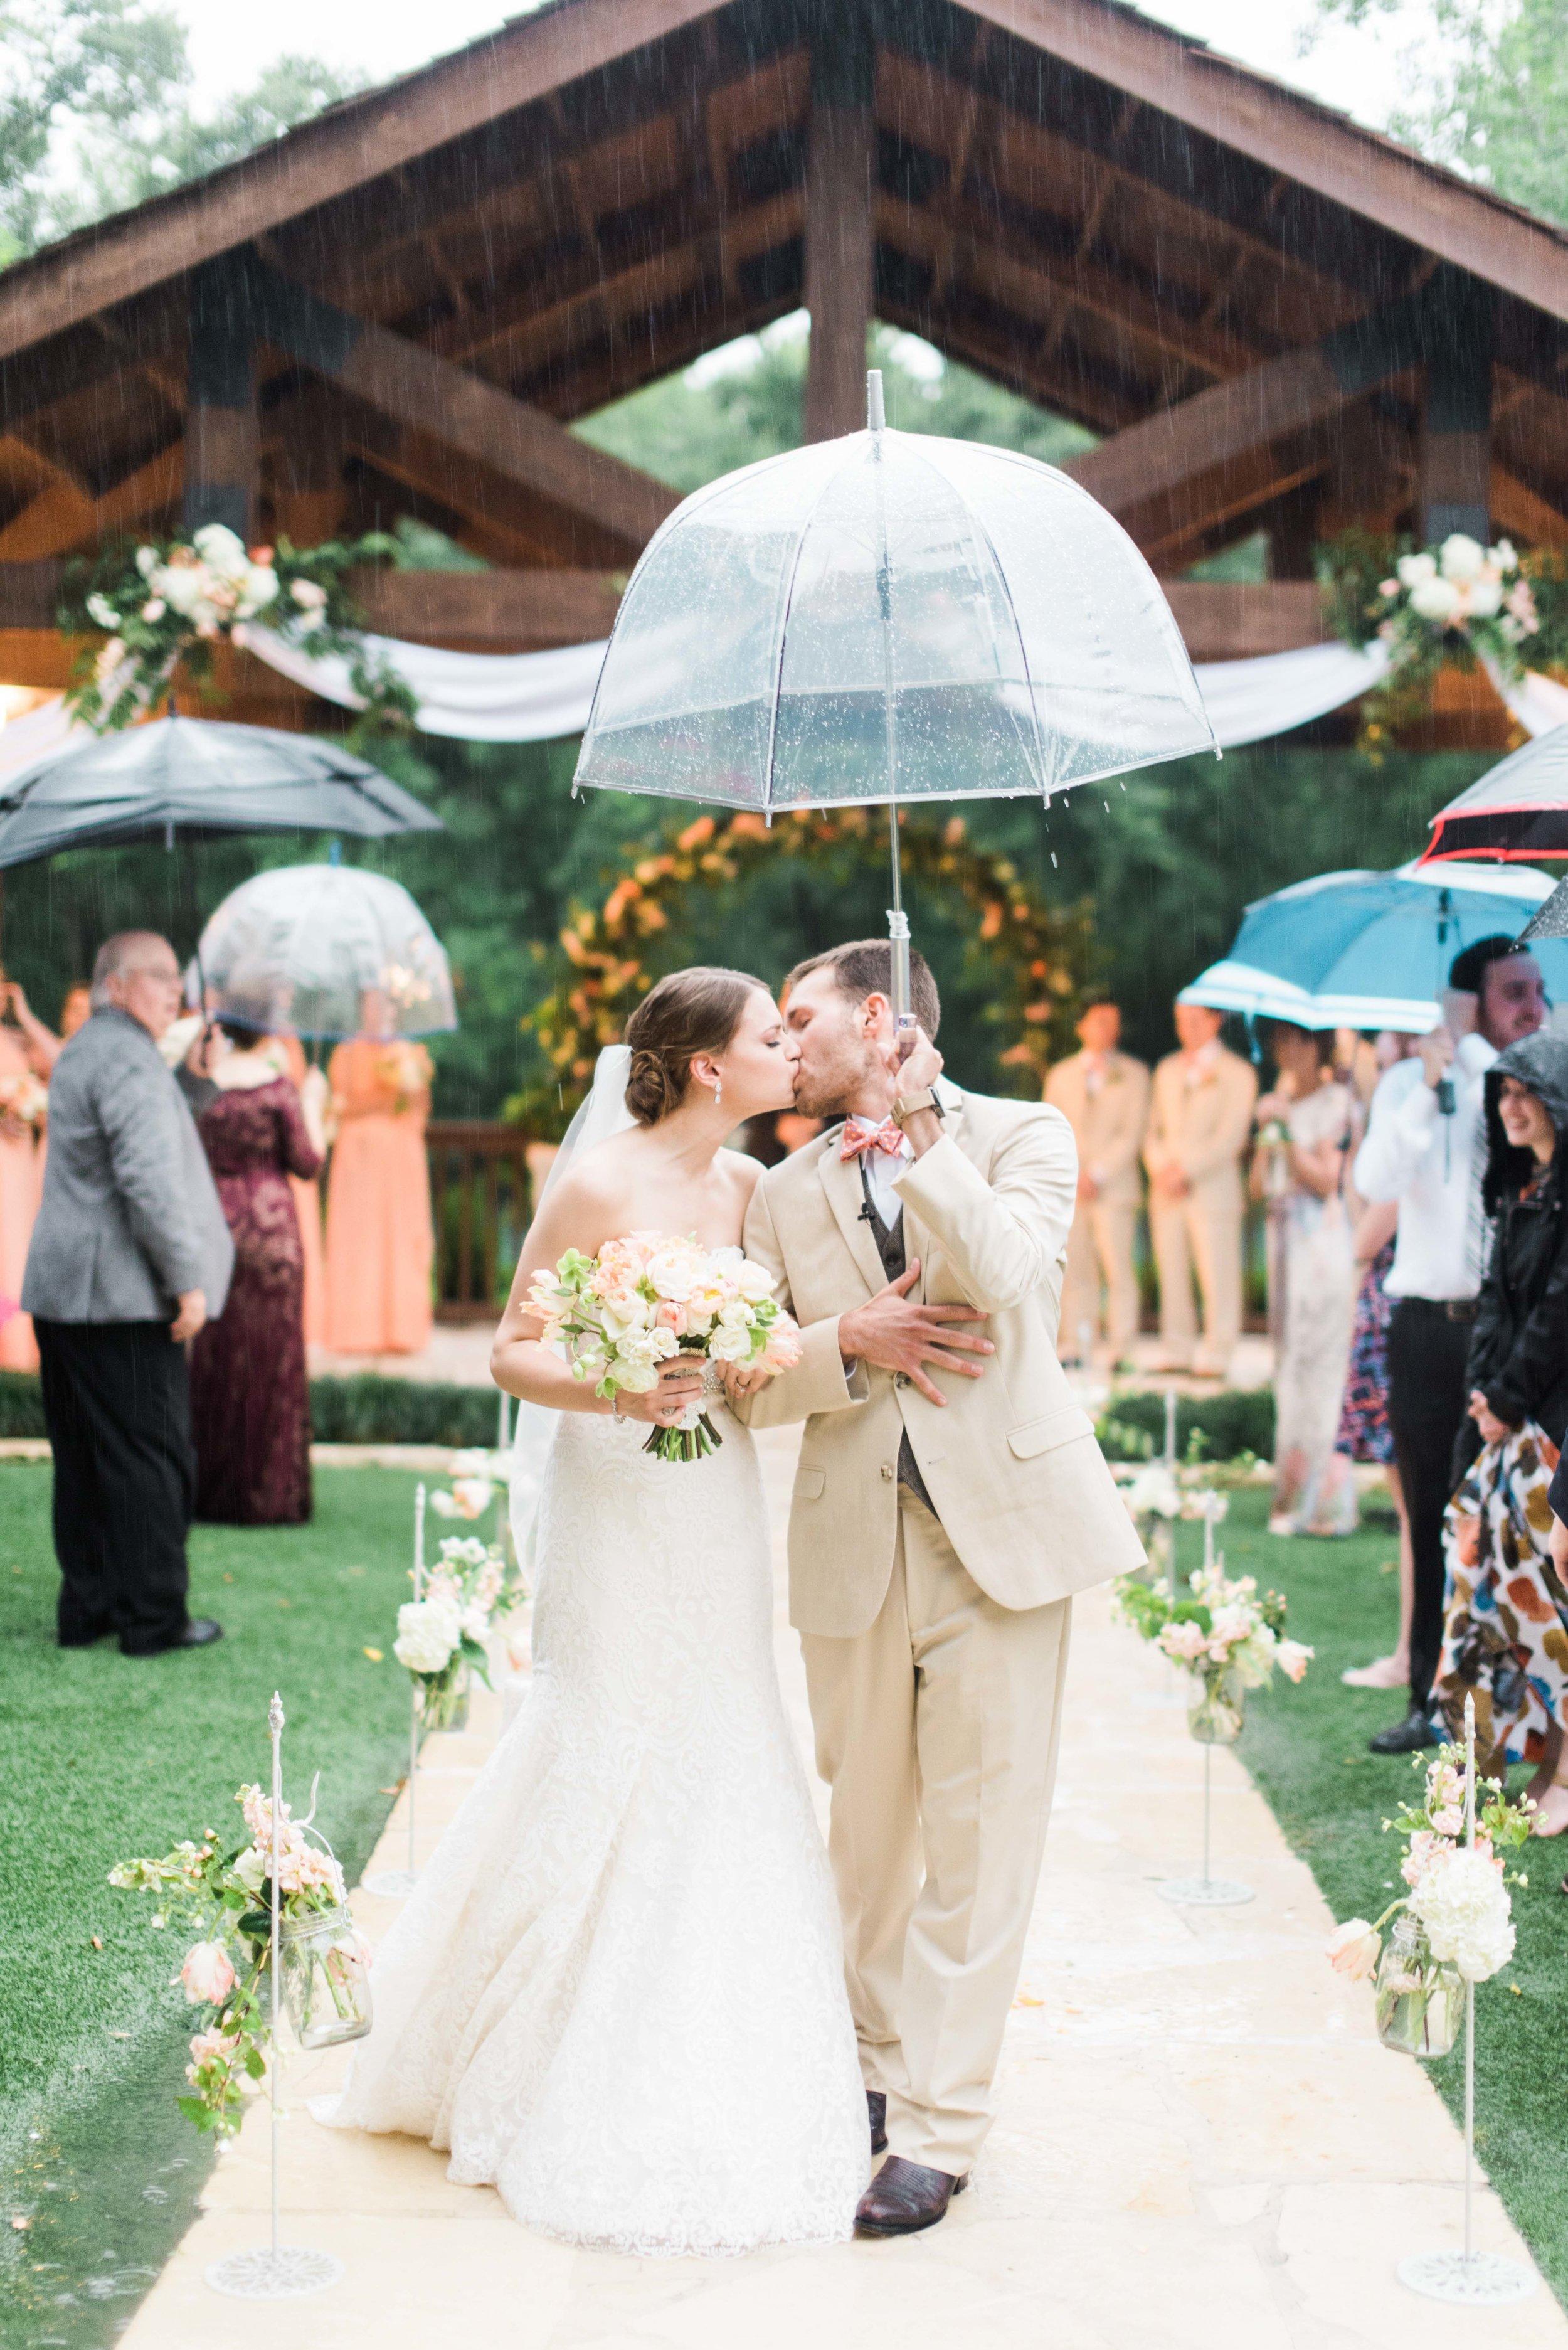 The-Knot-Wedding-Houston-Photographer-Fine-Art-Dana-Fernandez-Photography-Film-16.jpg